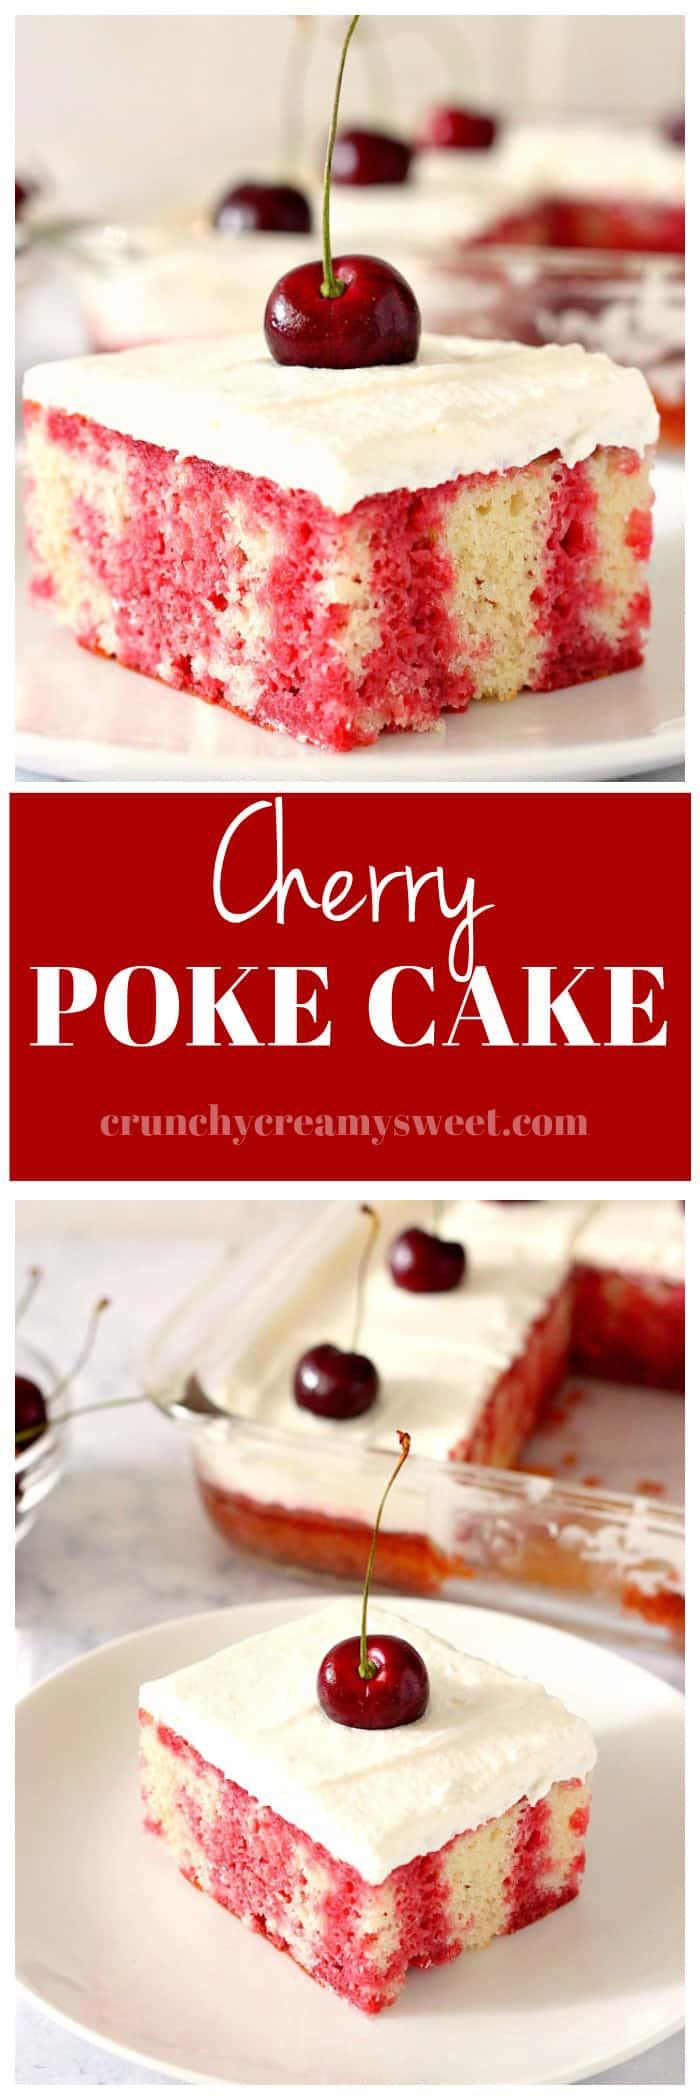 cherry poke cake recipe long Aa Cherry Poke Cake Recipe